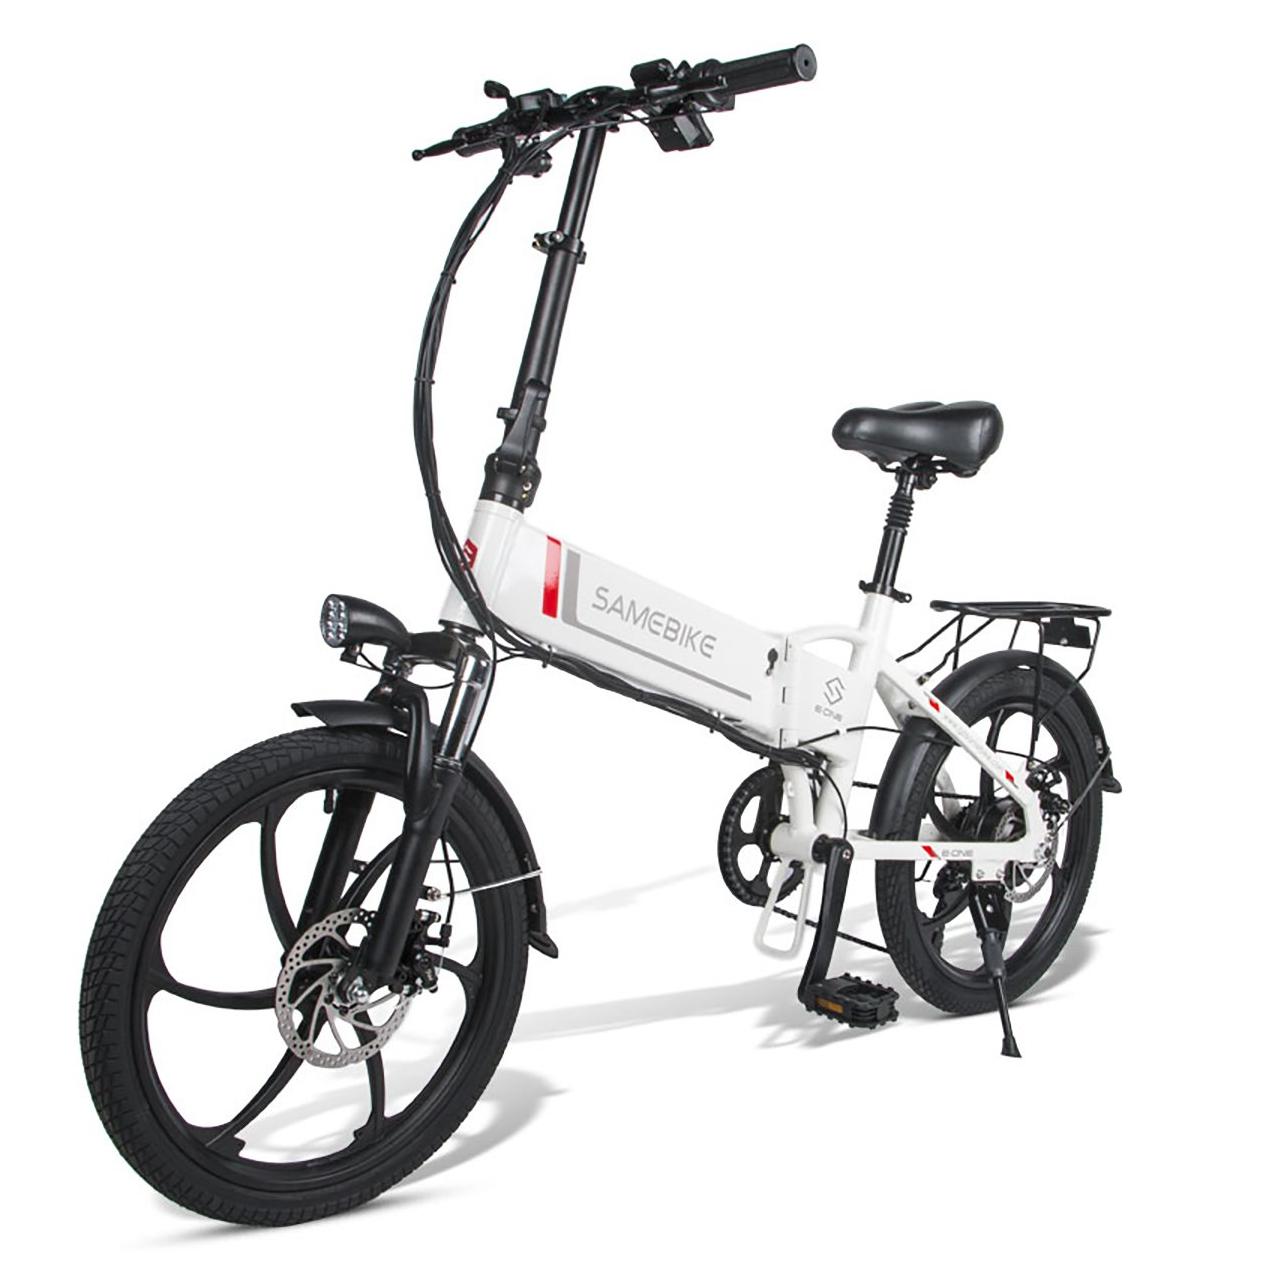 SAMEBIKE 20LVXD30 Folding Electric Bike 20 Inch Tires 350W Motor 10.4Ah Battery Max 35 KPH Ship from UK Warehouse